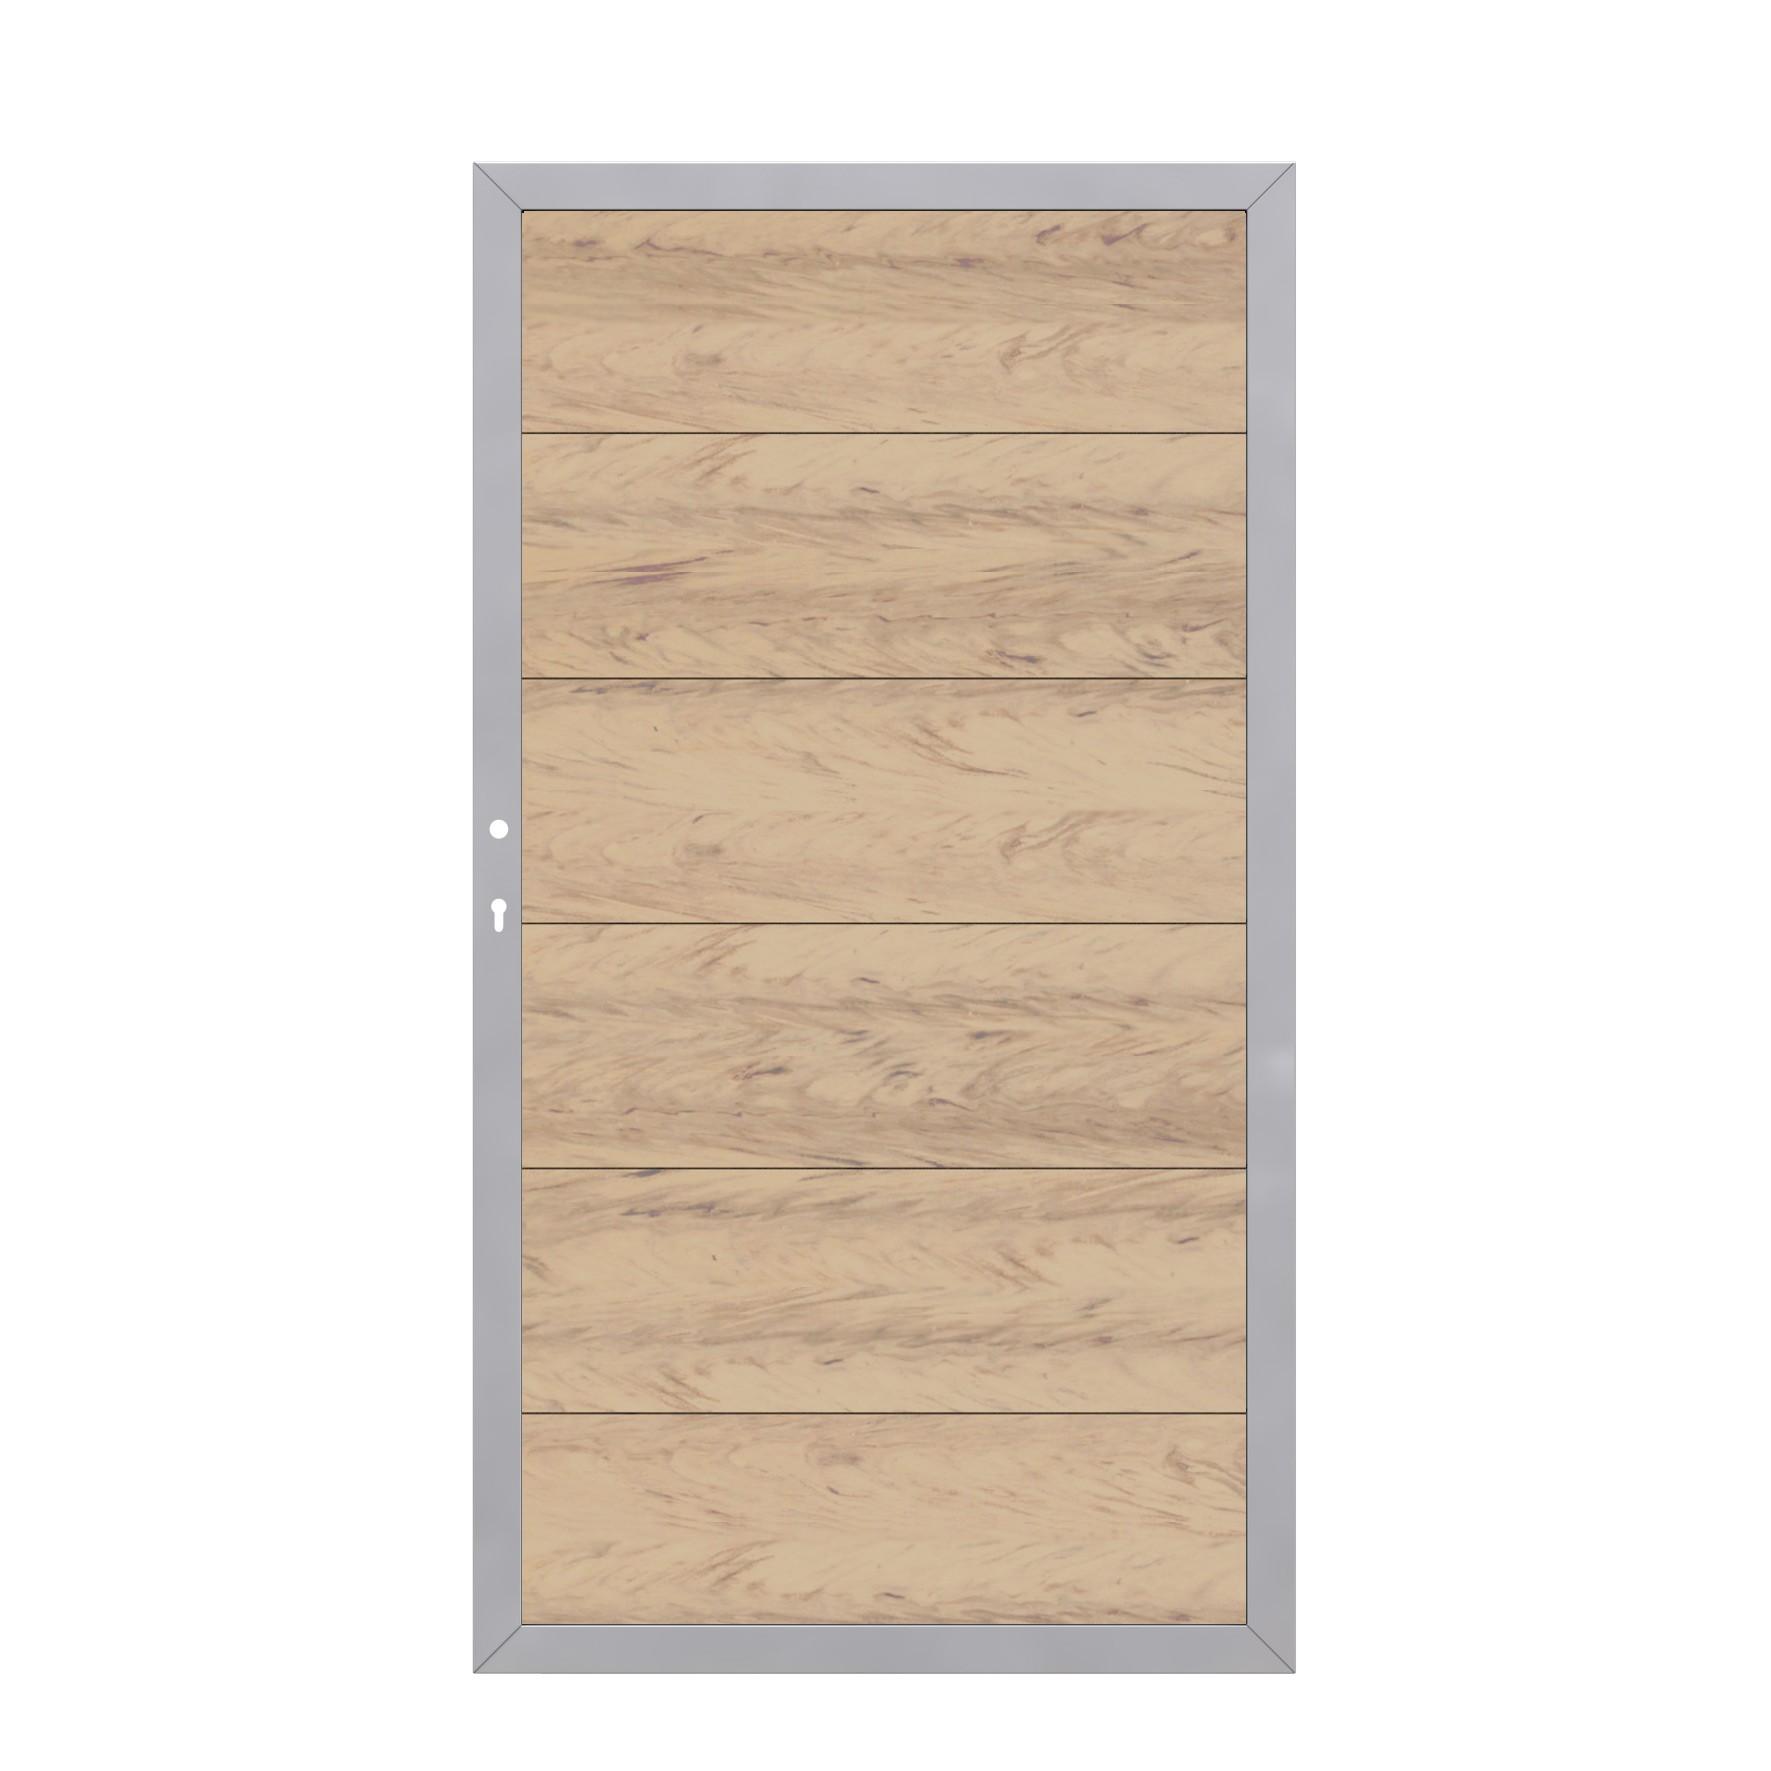 sichtschutzzaun tor design wpc alu sand din links 98x180cm bei. Black Bedroom Furniture Sets. Home Design Ideas